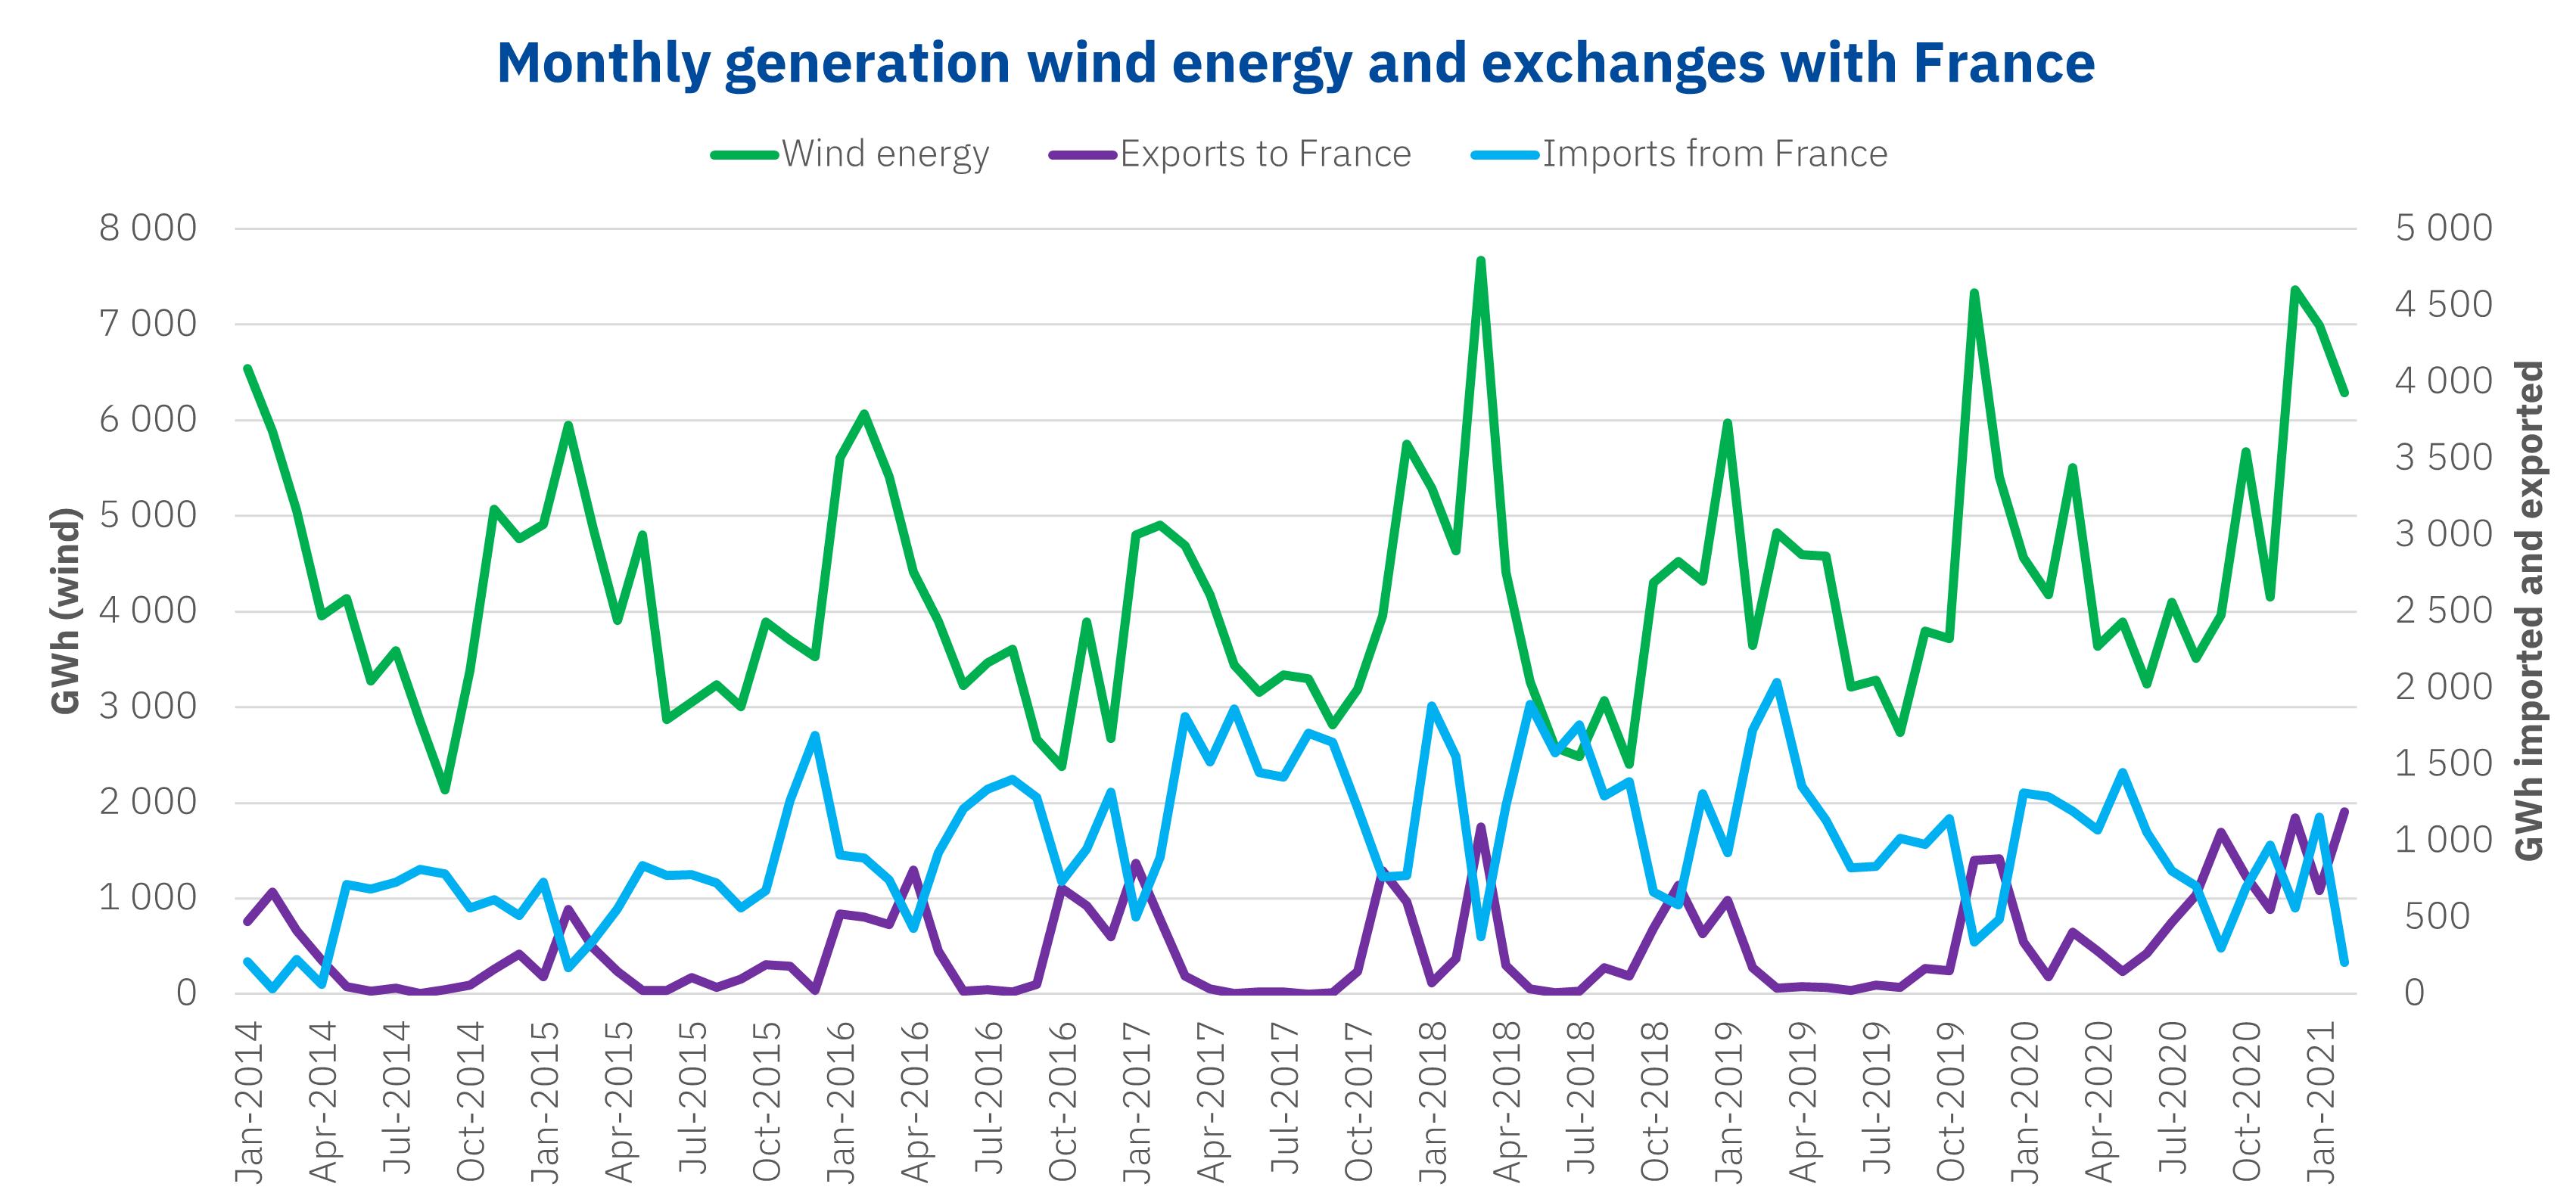 AleaSoft - Electricity generation wind energy exchanges France